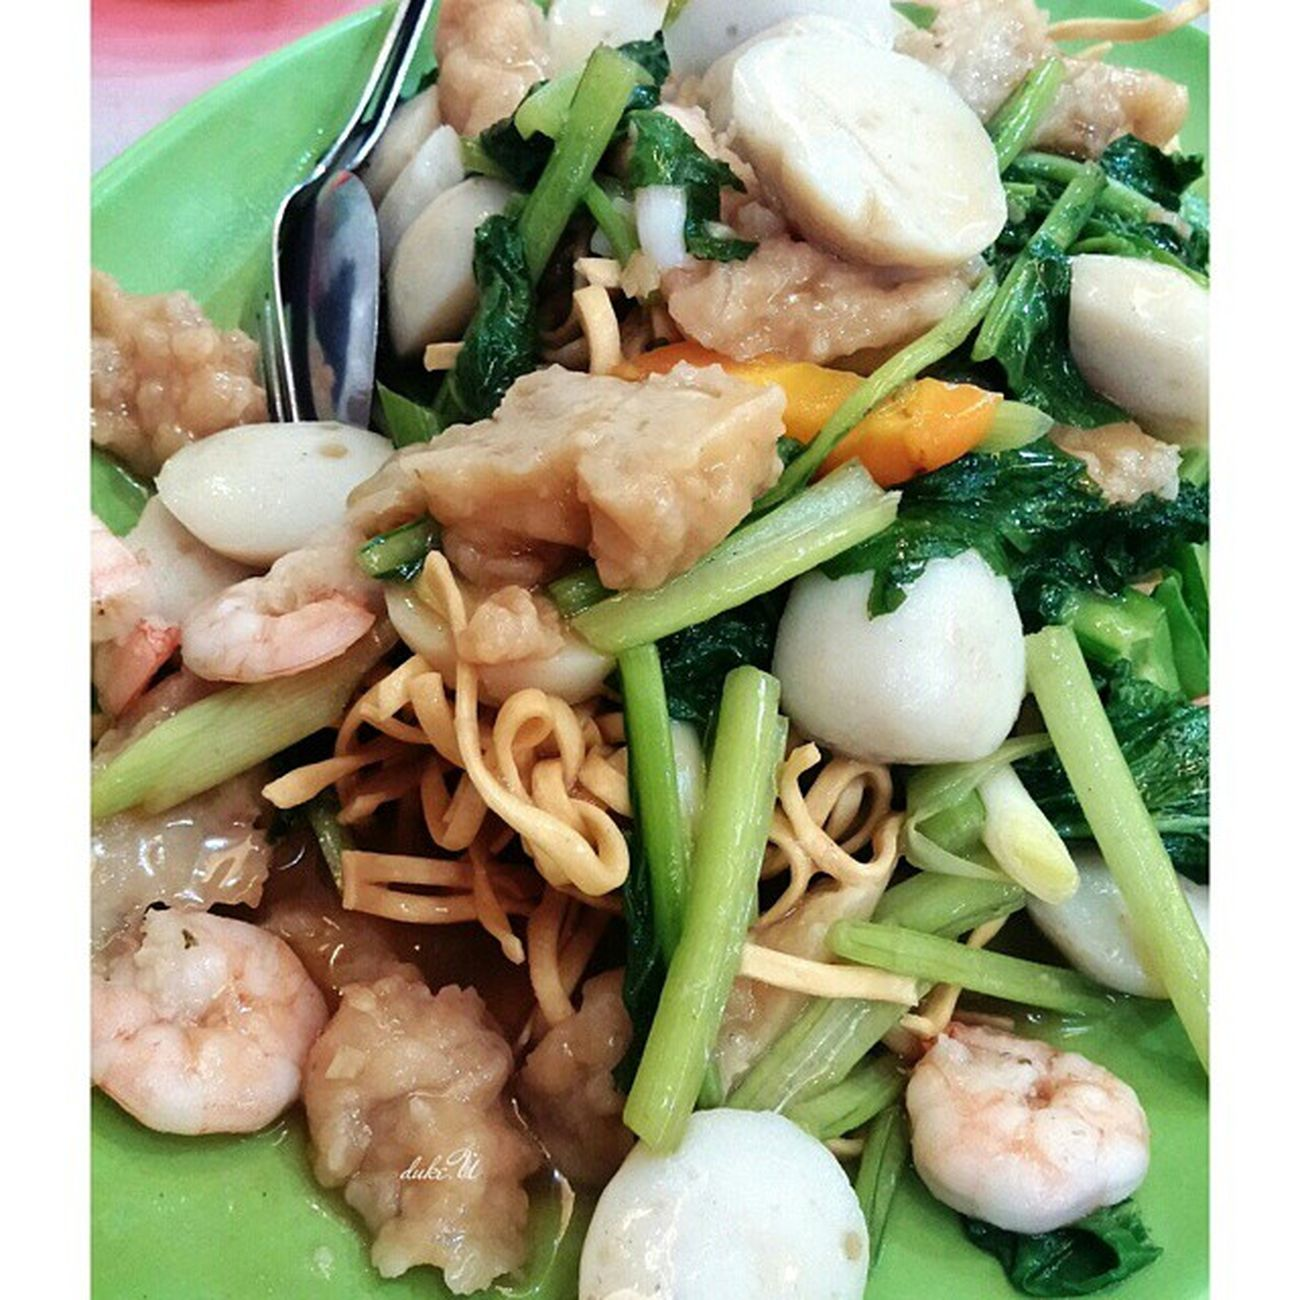 Crunchy Seafood Noodles a.k.a Ifumie Binjai Medanfood kulinerMedan kulinerIndonesia Nusantara yummy asianfood gastronomy foodphotography foodie foodgasm foodporn Chinesefood lgg2 yum instafood foodstagram foodlover traditionalfood authenticfood Indonesiantimes describeIndonesia IeatIndonesia culinaryart culinary